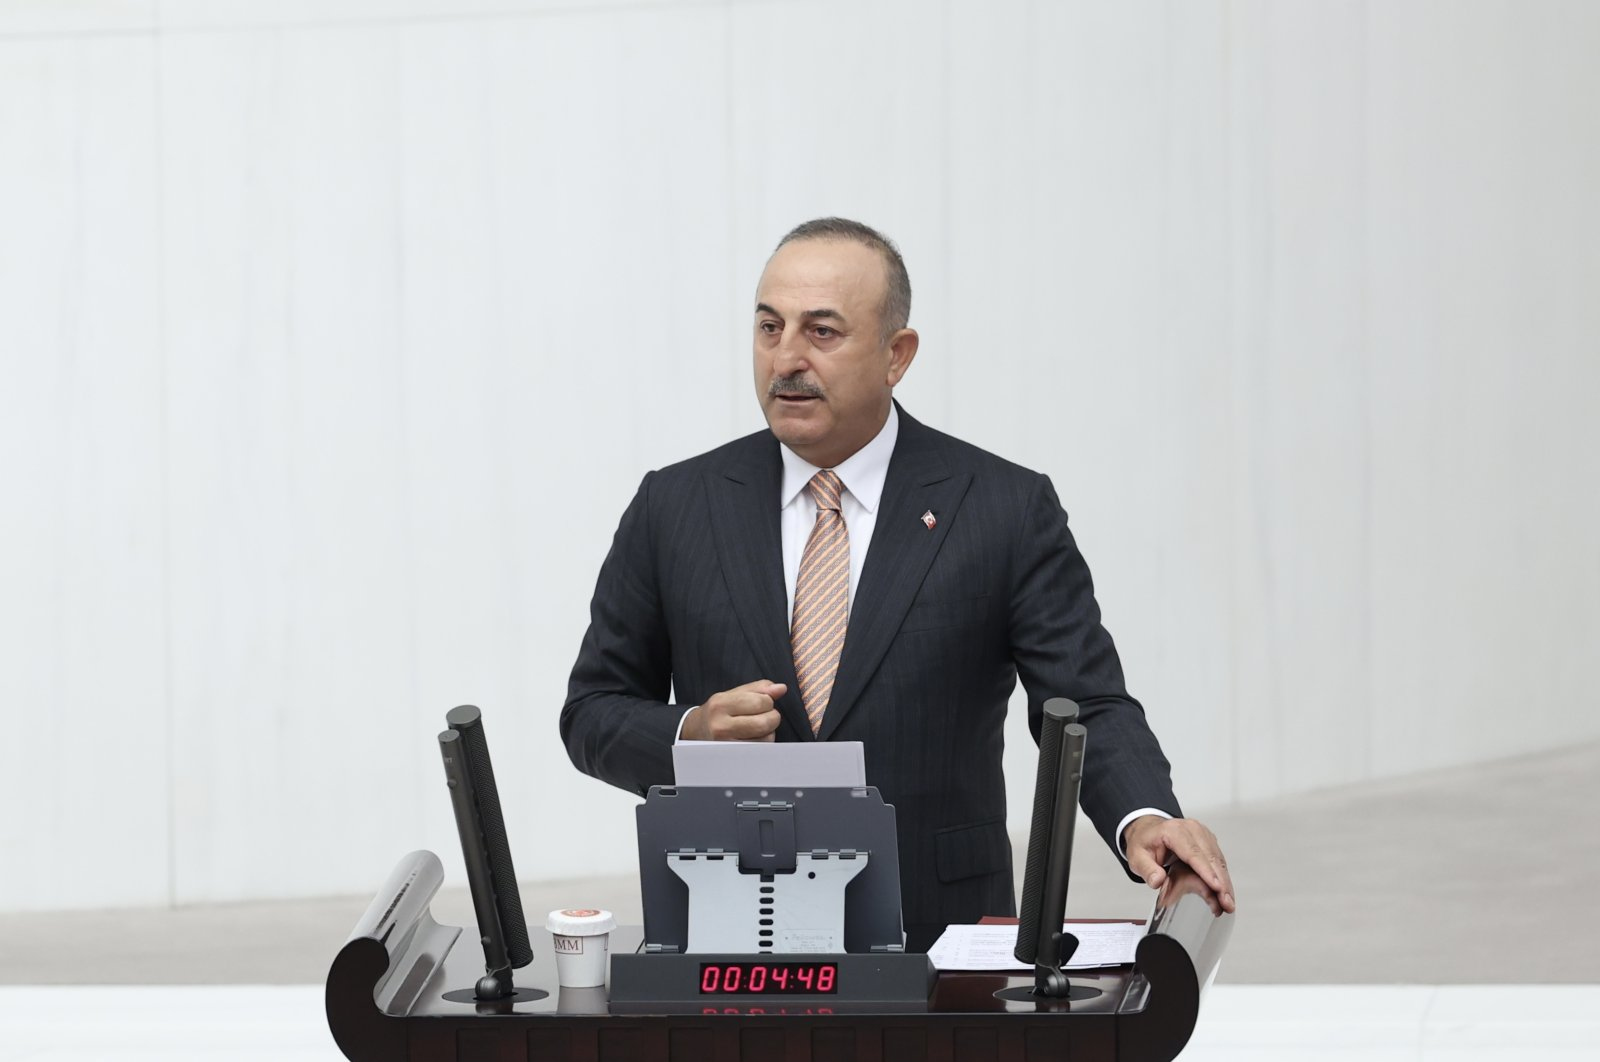 Foreign Minister Mevlüt Çavuşoğlu speaks at the Turkish Parliament in the capital Ankara, Turkey, May 18, 2021. (AA Photo)